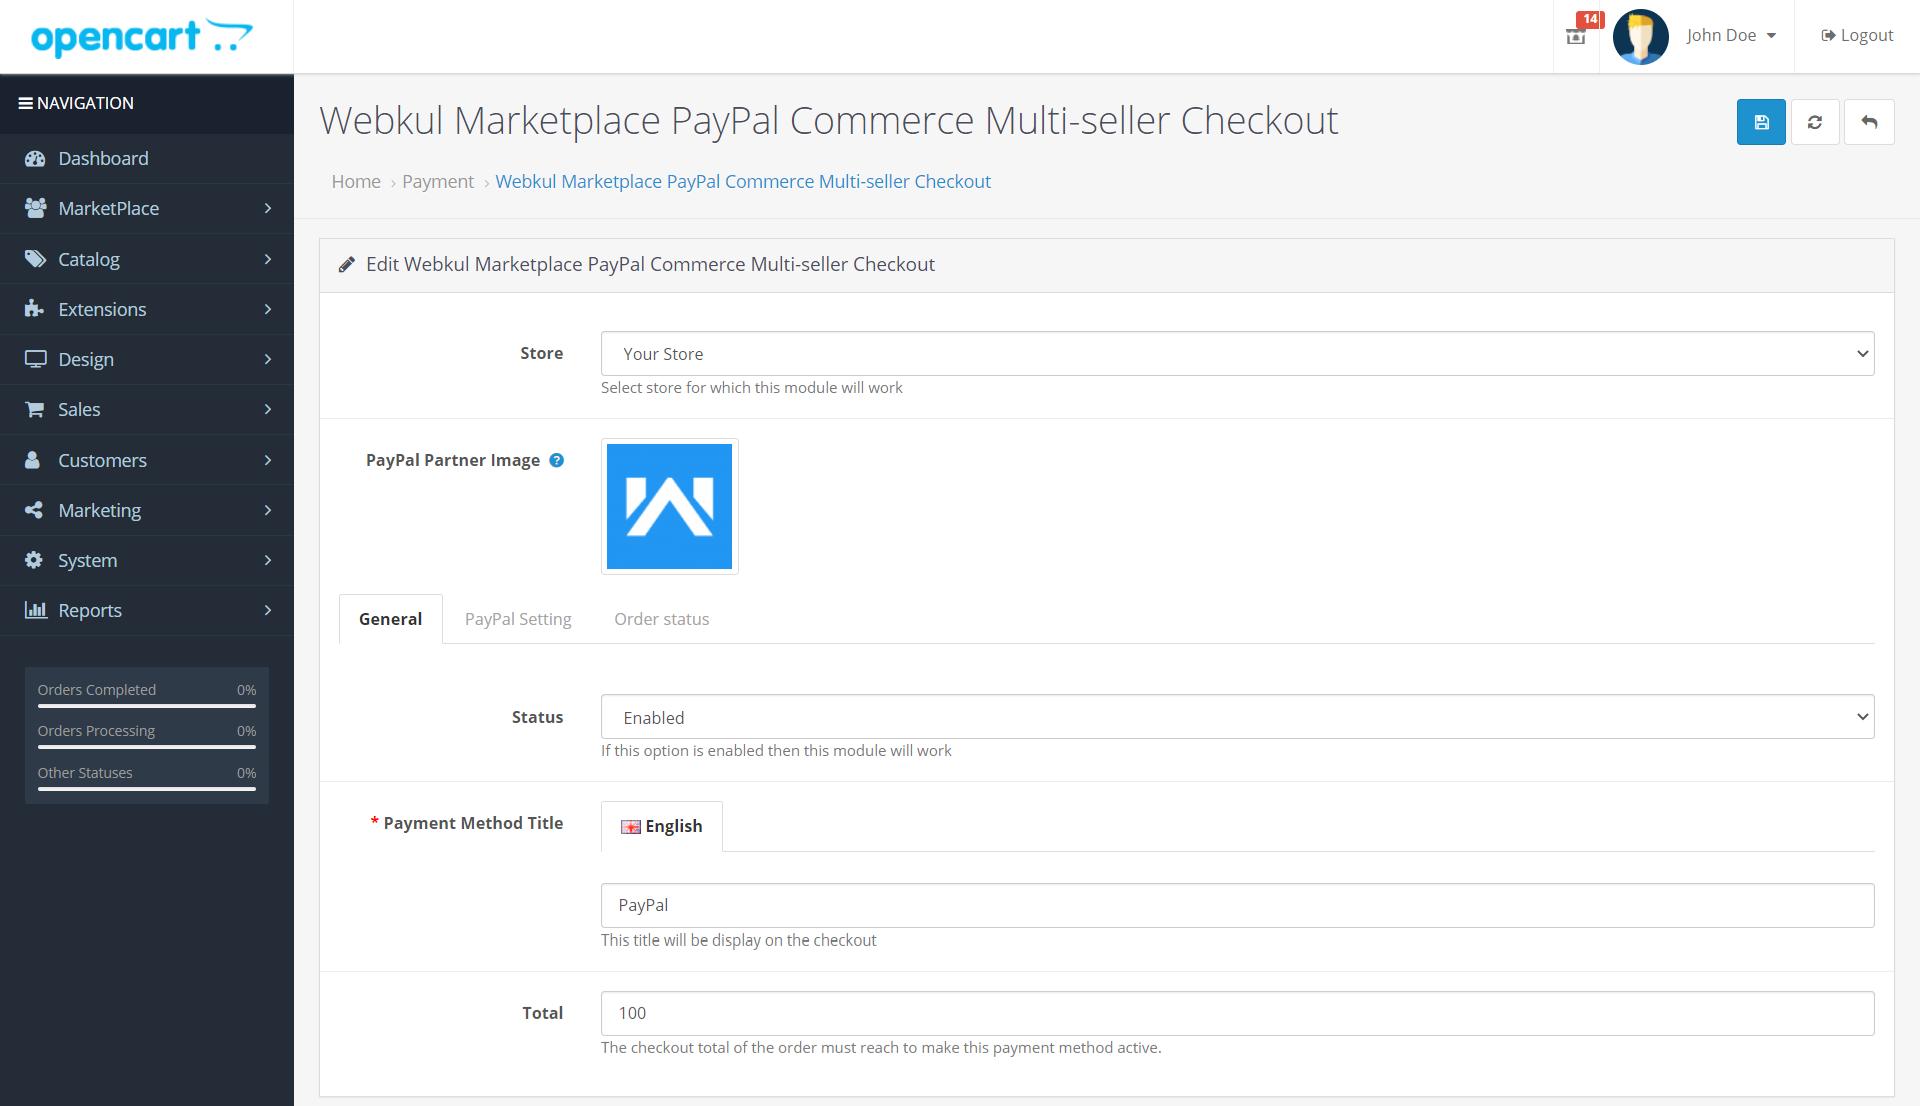 Webkul-Marketplace-PayPal-Commerce-Multi-seller-Checkout-1-2